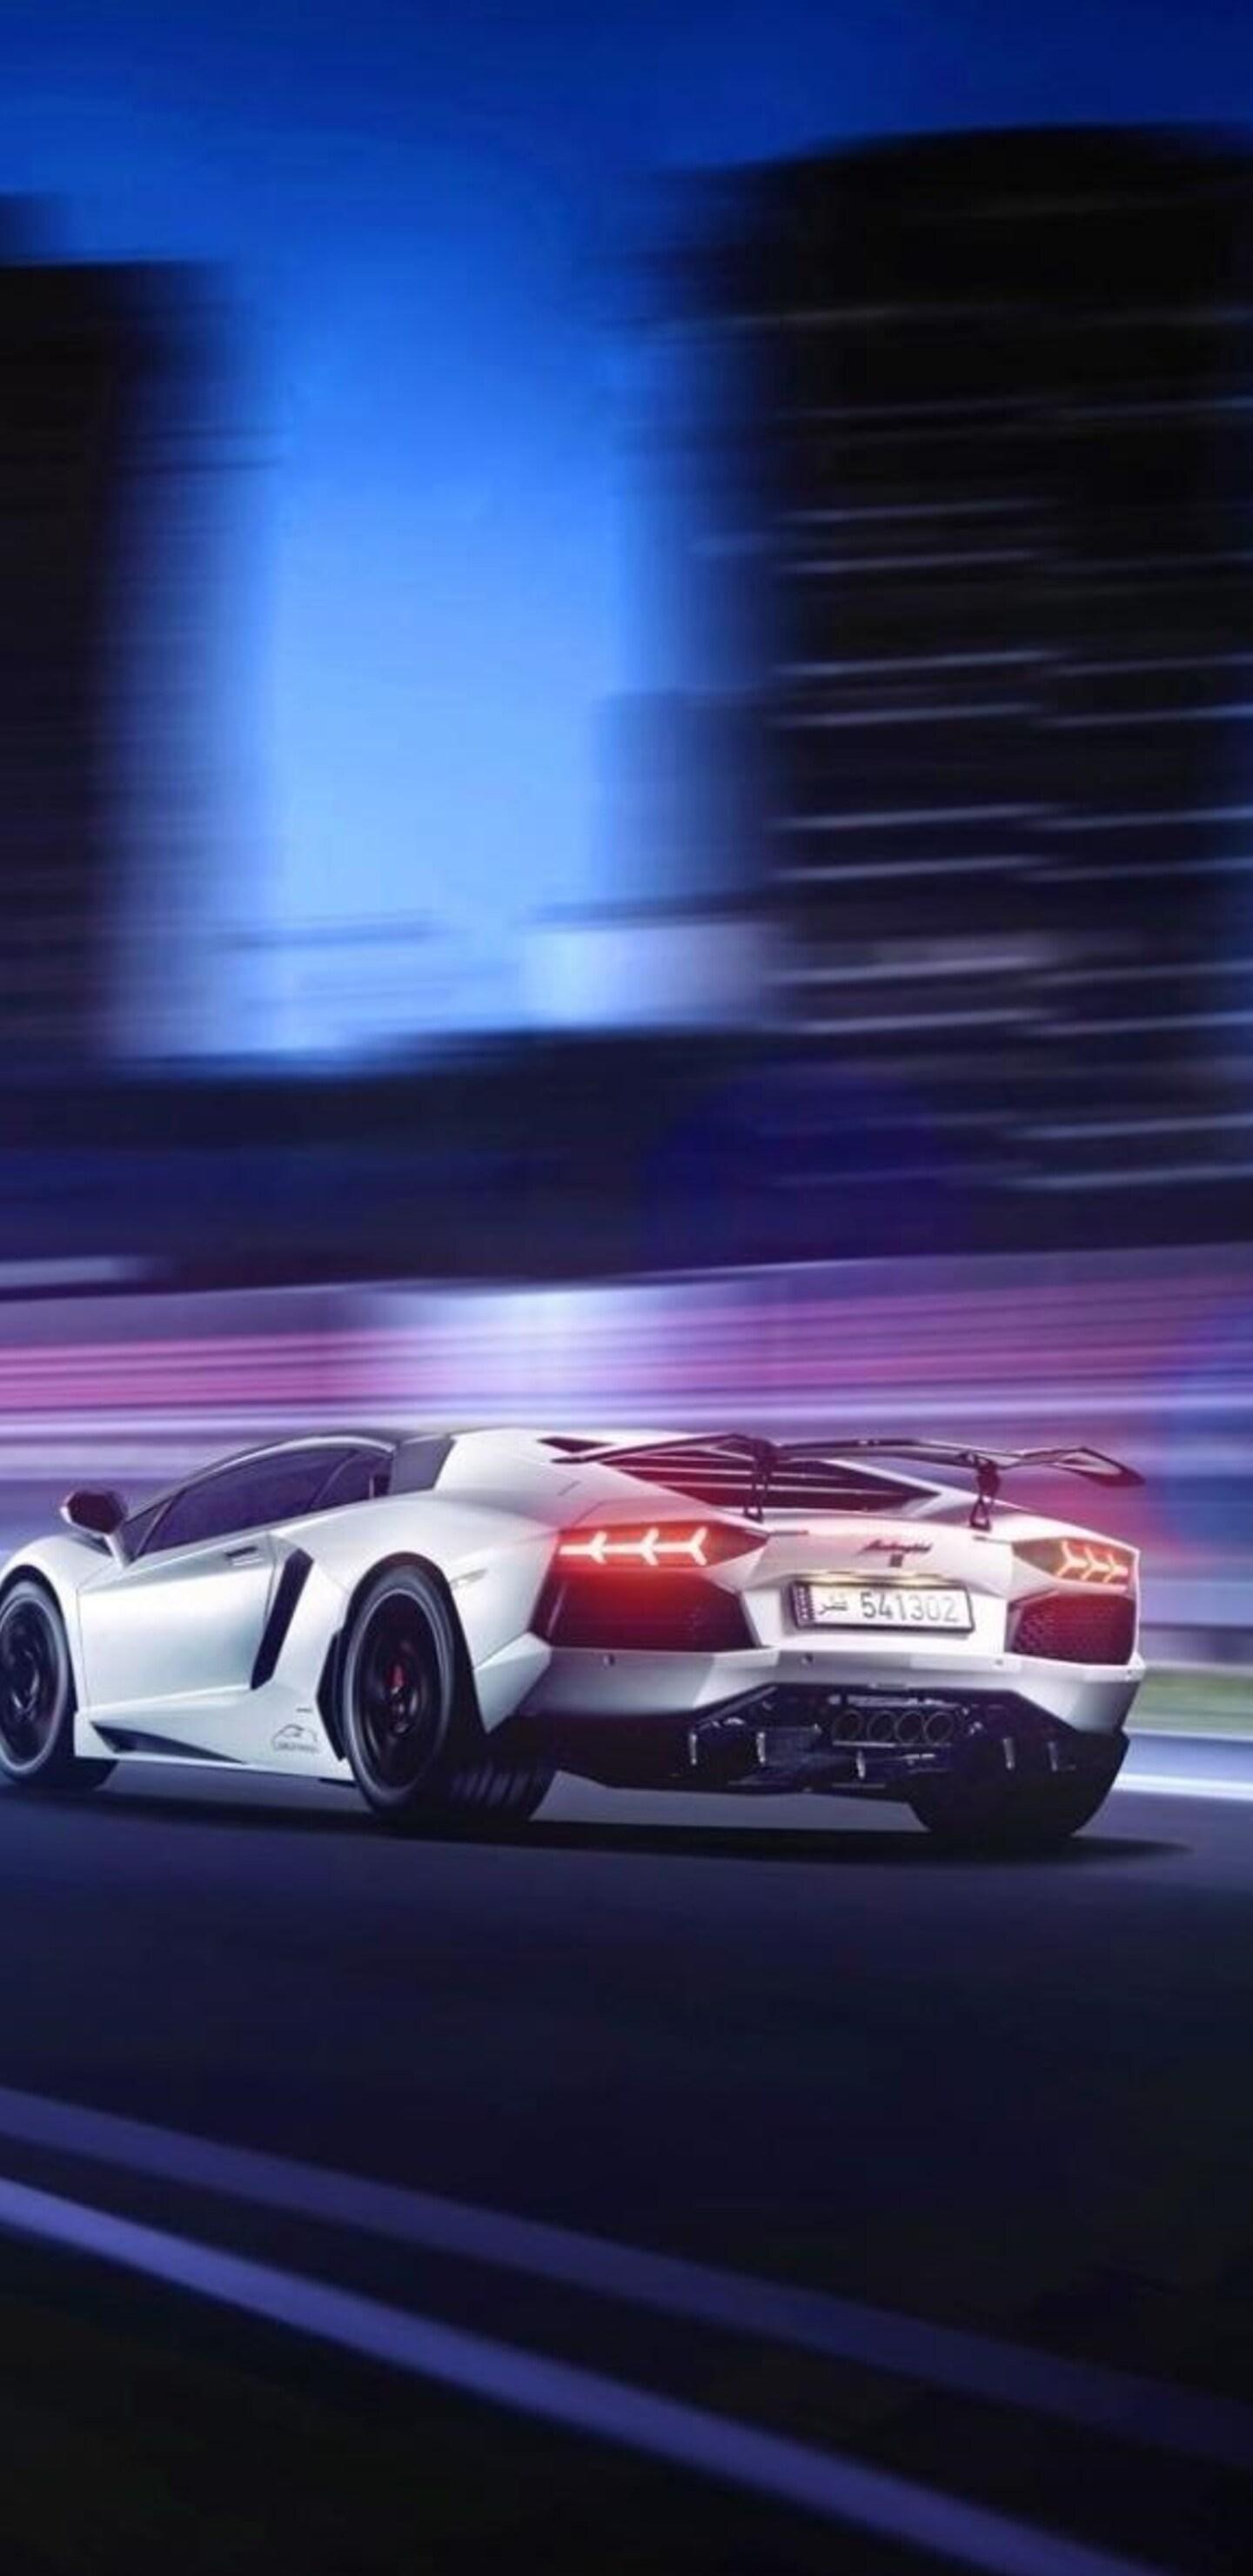 1440x2960 Lamborghini Aventador Motion Blur Samsung Galaxy Note 9 8